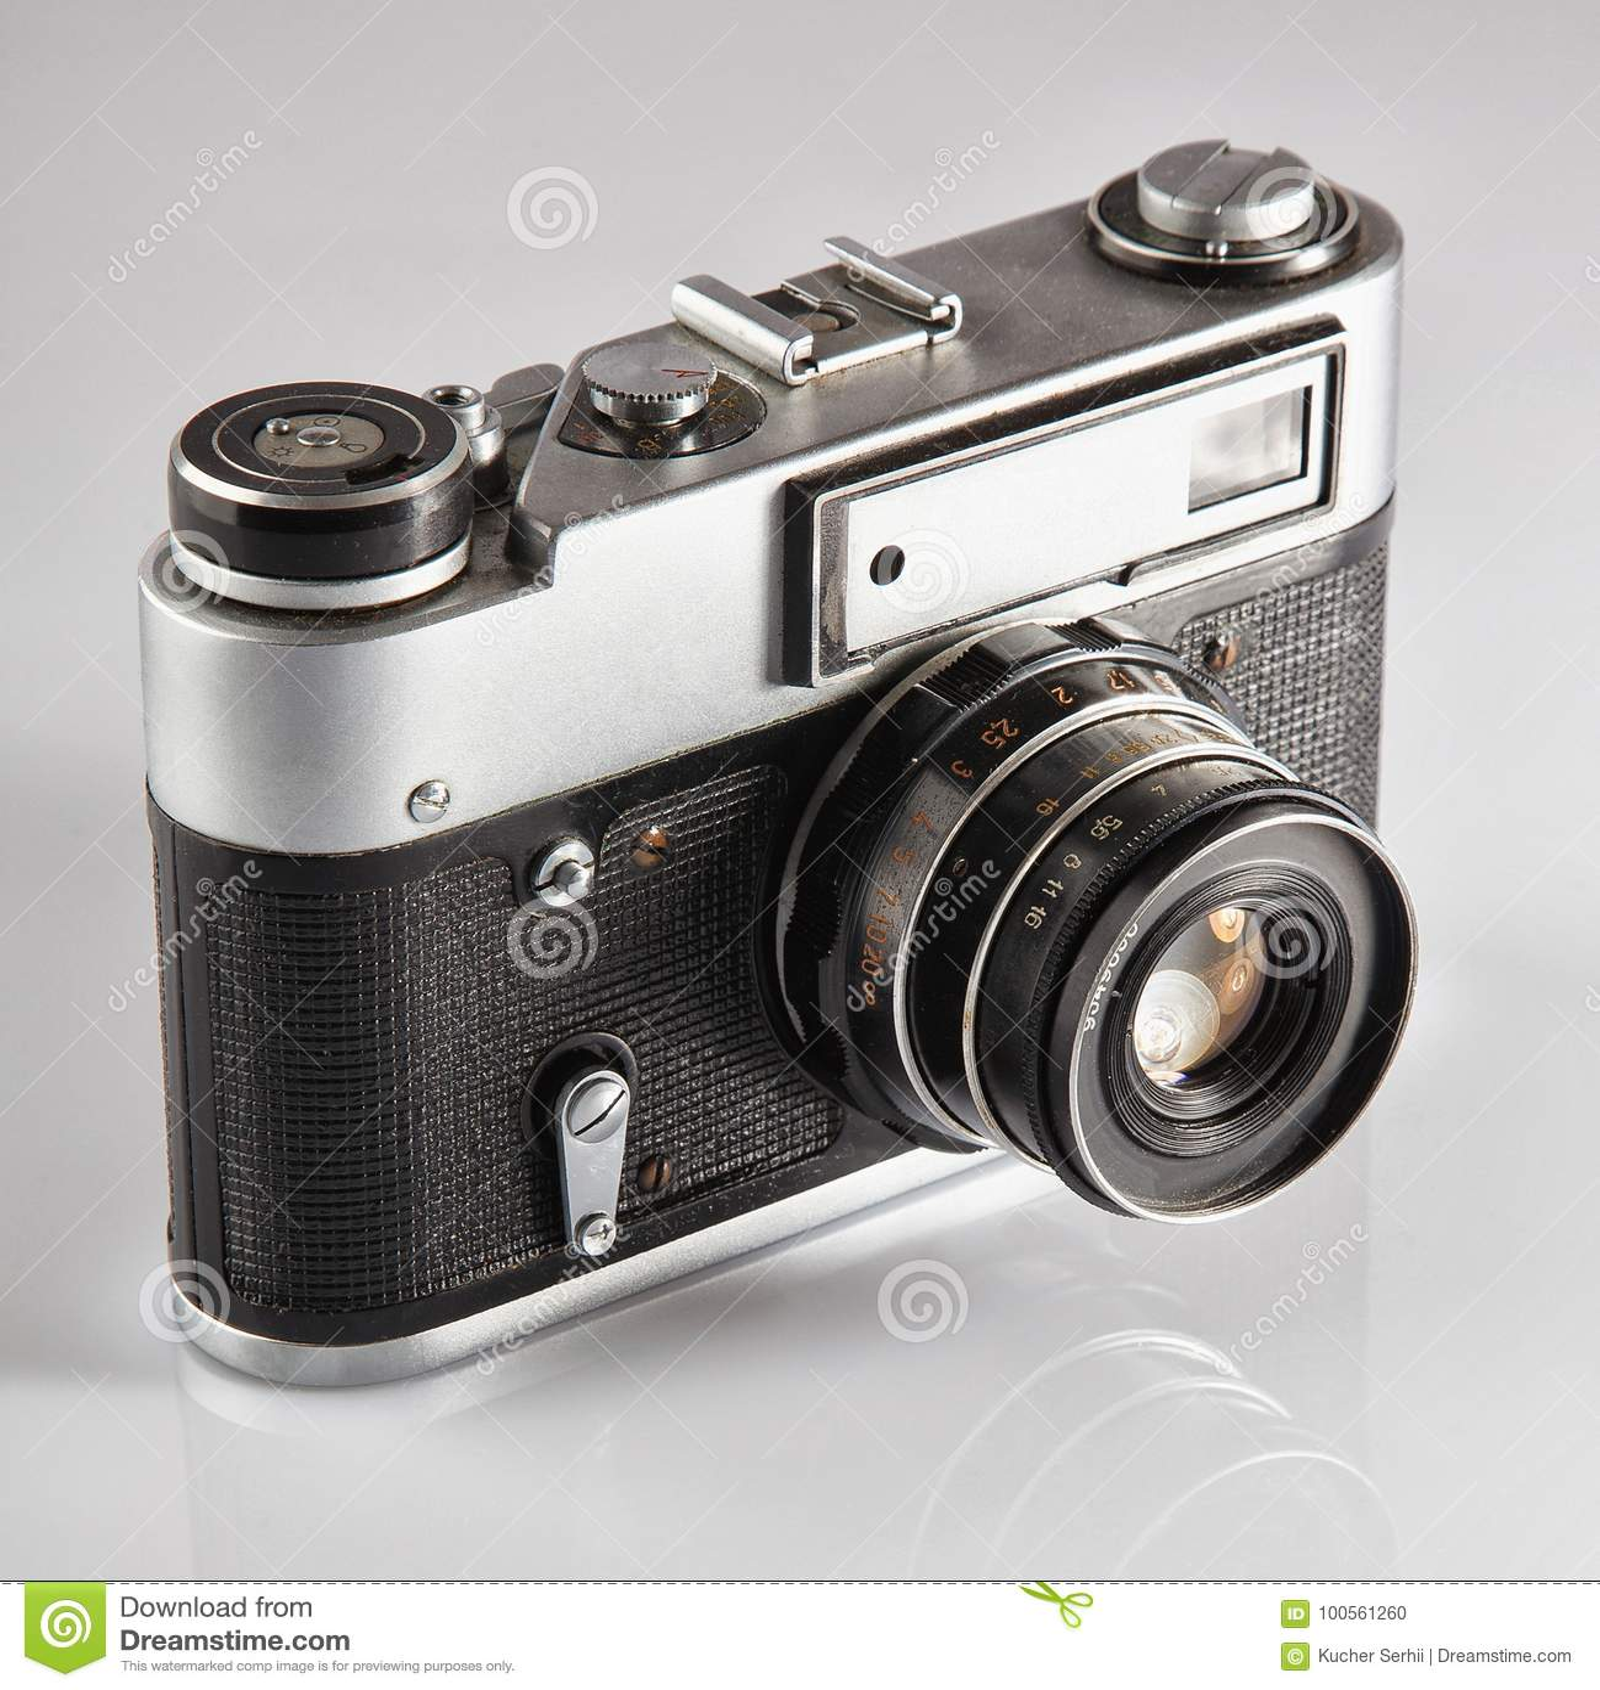 dc9debc1bb75e Retro Camera. Vintage Photocamera. Stock Photo - Image of closeup ...